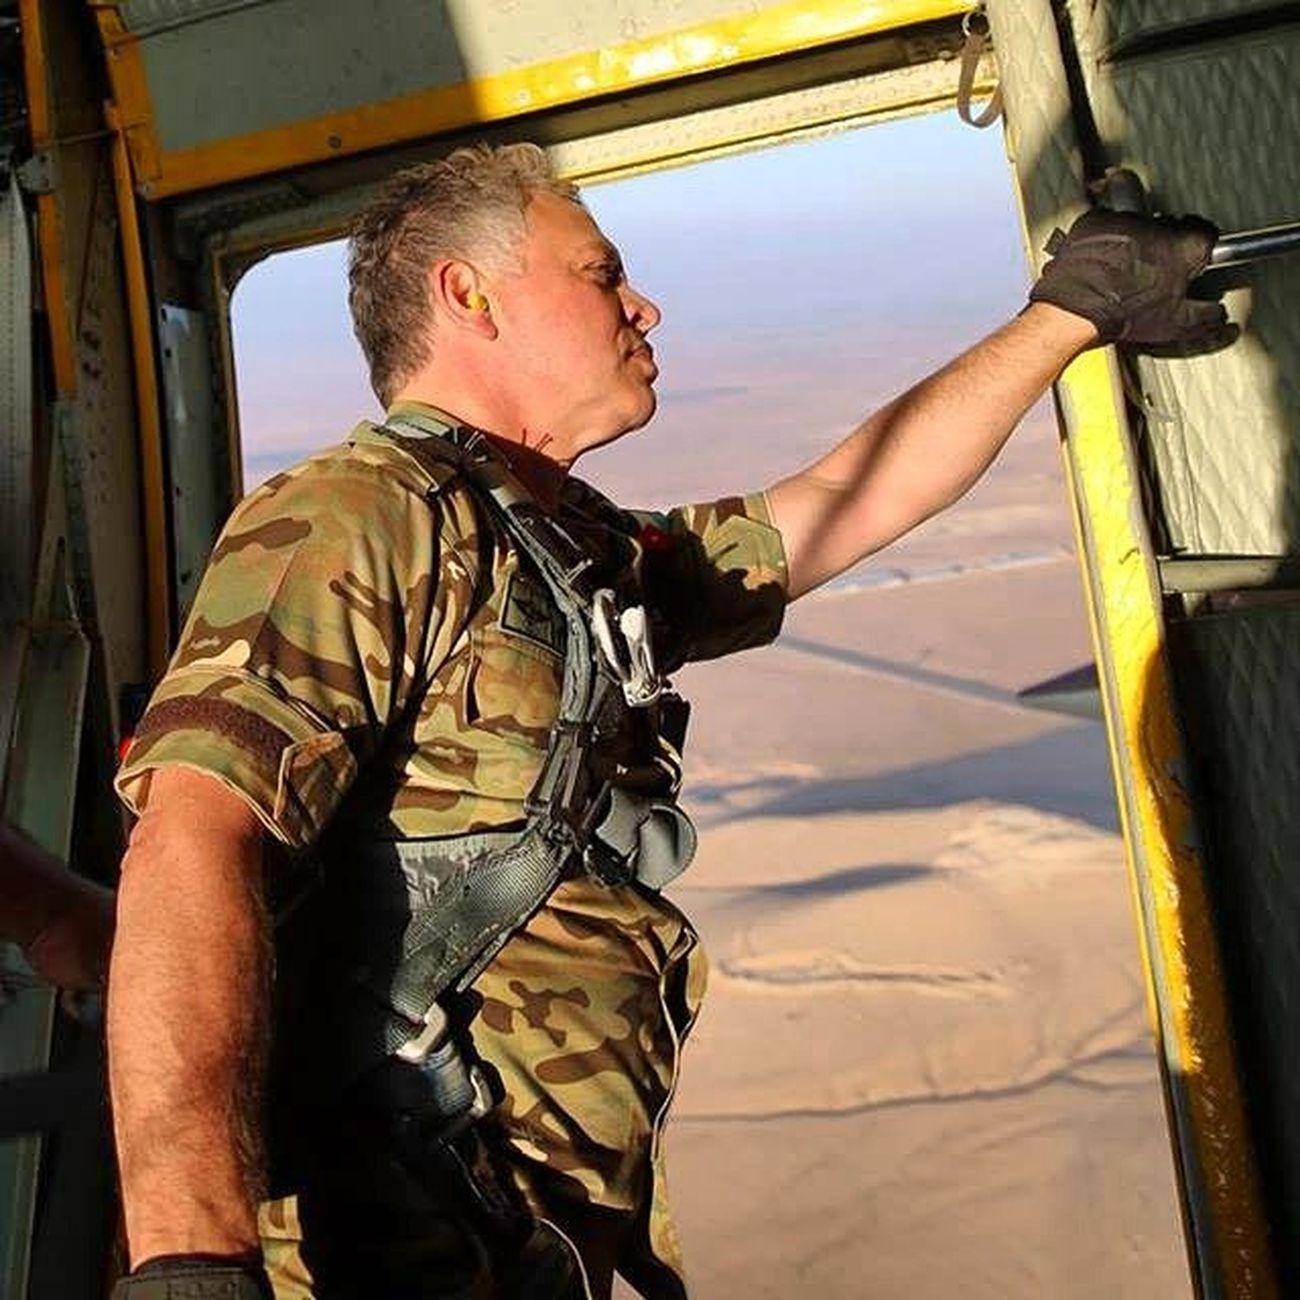 Hismajesty King Abdullah_|| Jo jordan love_jordan royal hasheimate court rhcjo @rhcjo instaJO الاردن أردن المملكه_الاردنيه_الهاشميه اﻷردن